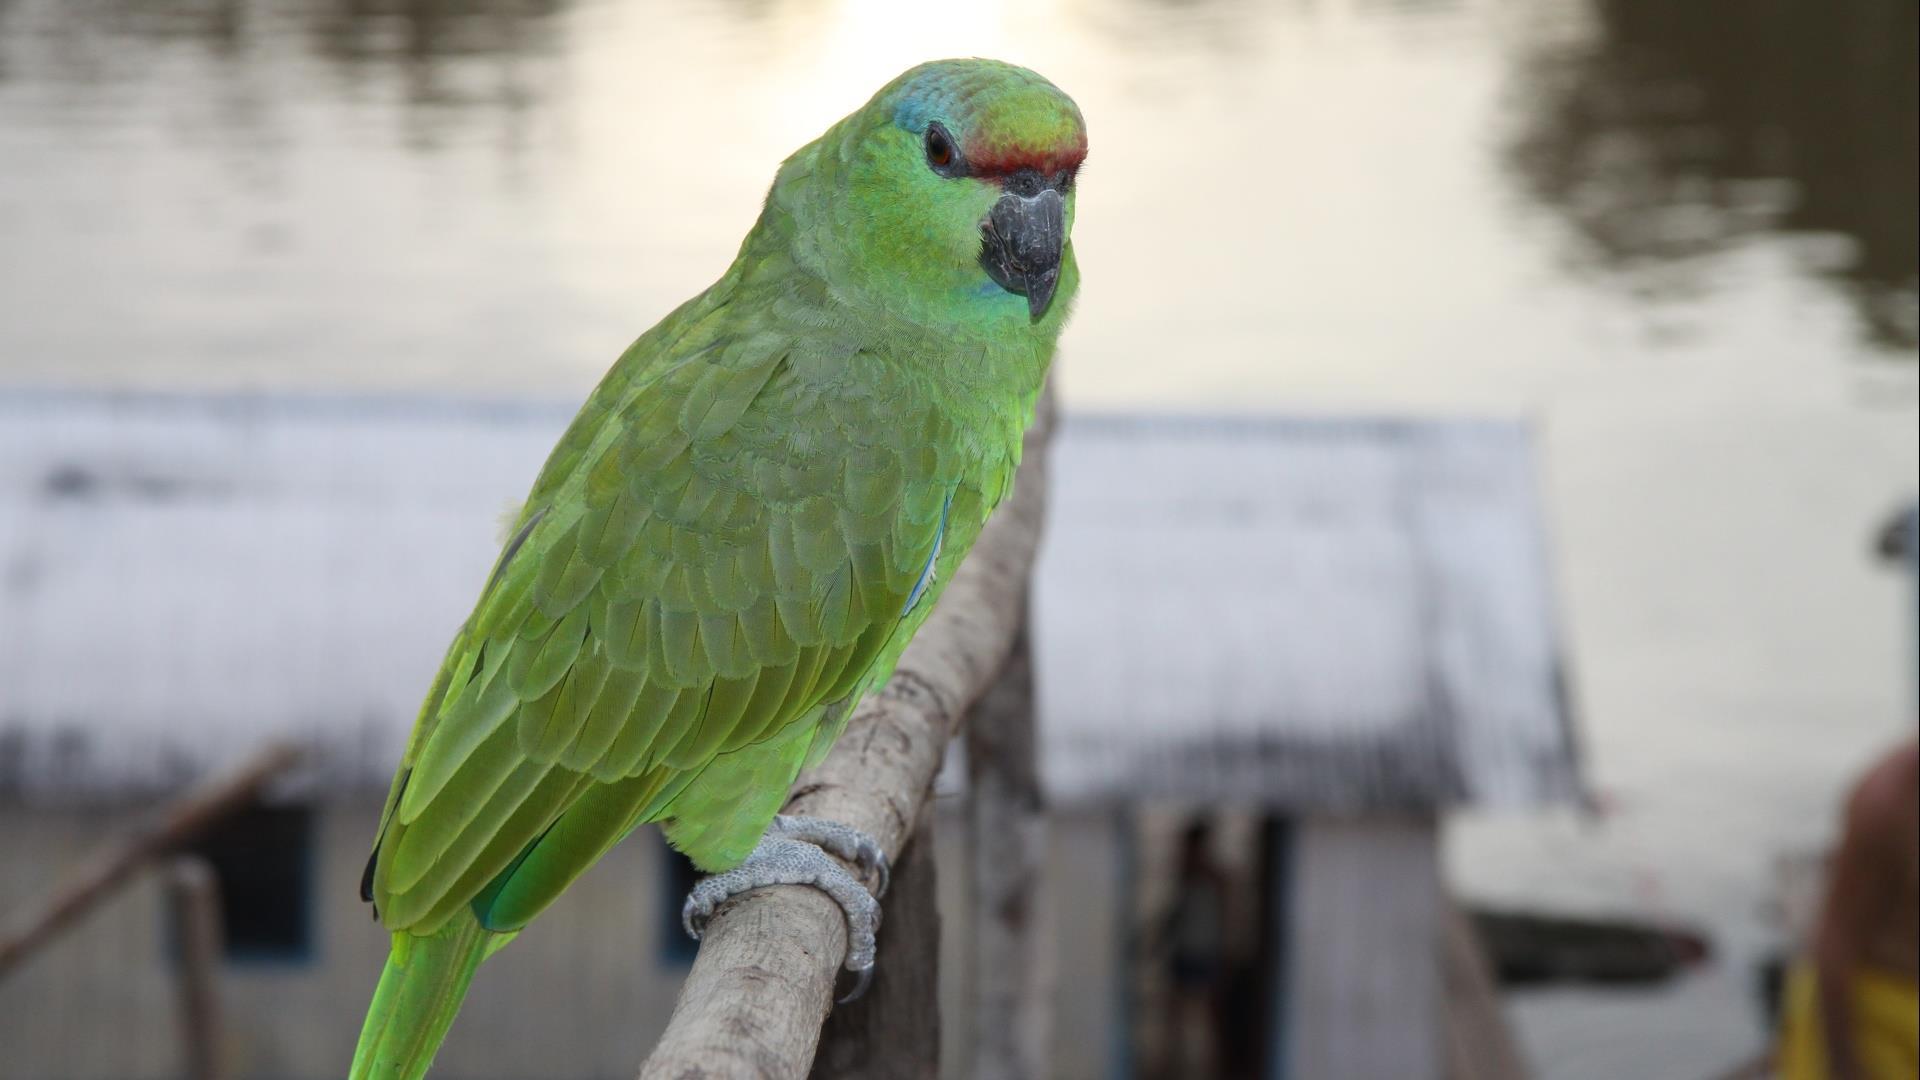 Brasilien Amazonas: 3 Tage Reisebaustein - Turtle Lodge Acai Paket: Grüner Papagei